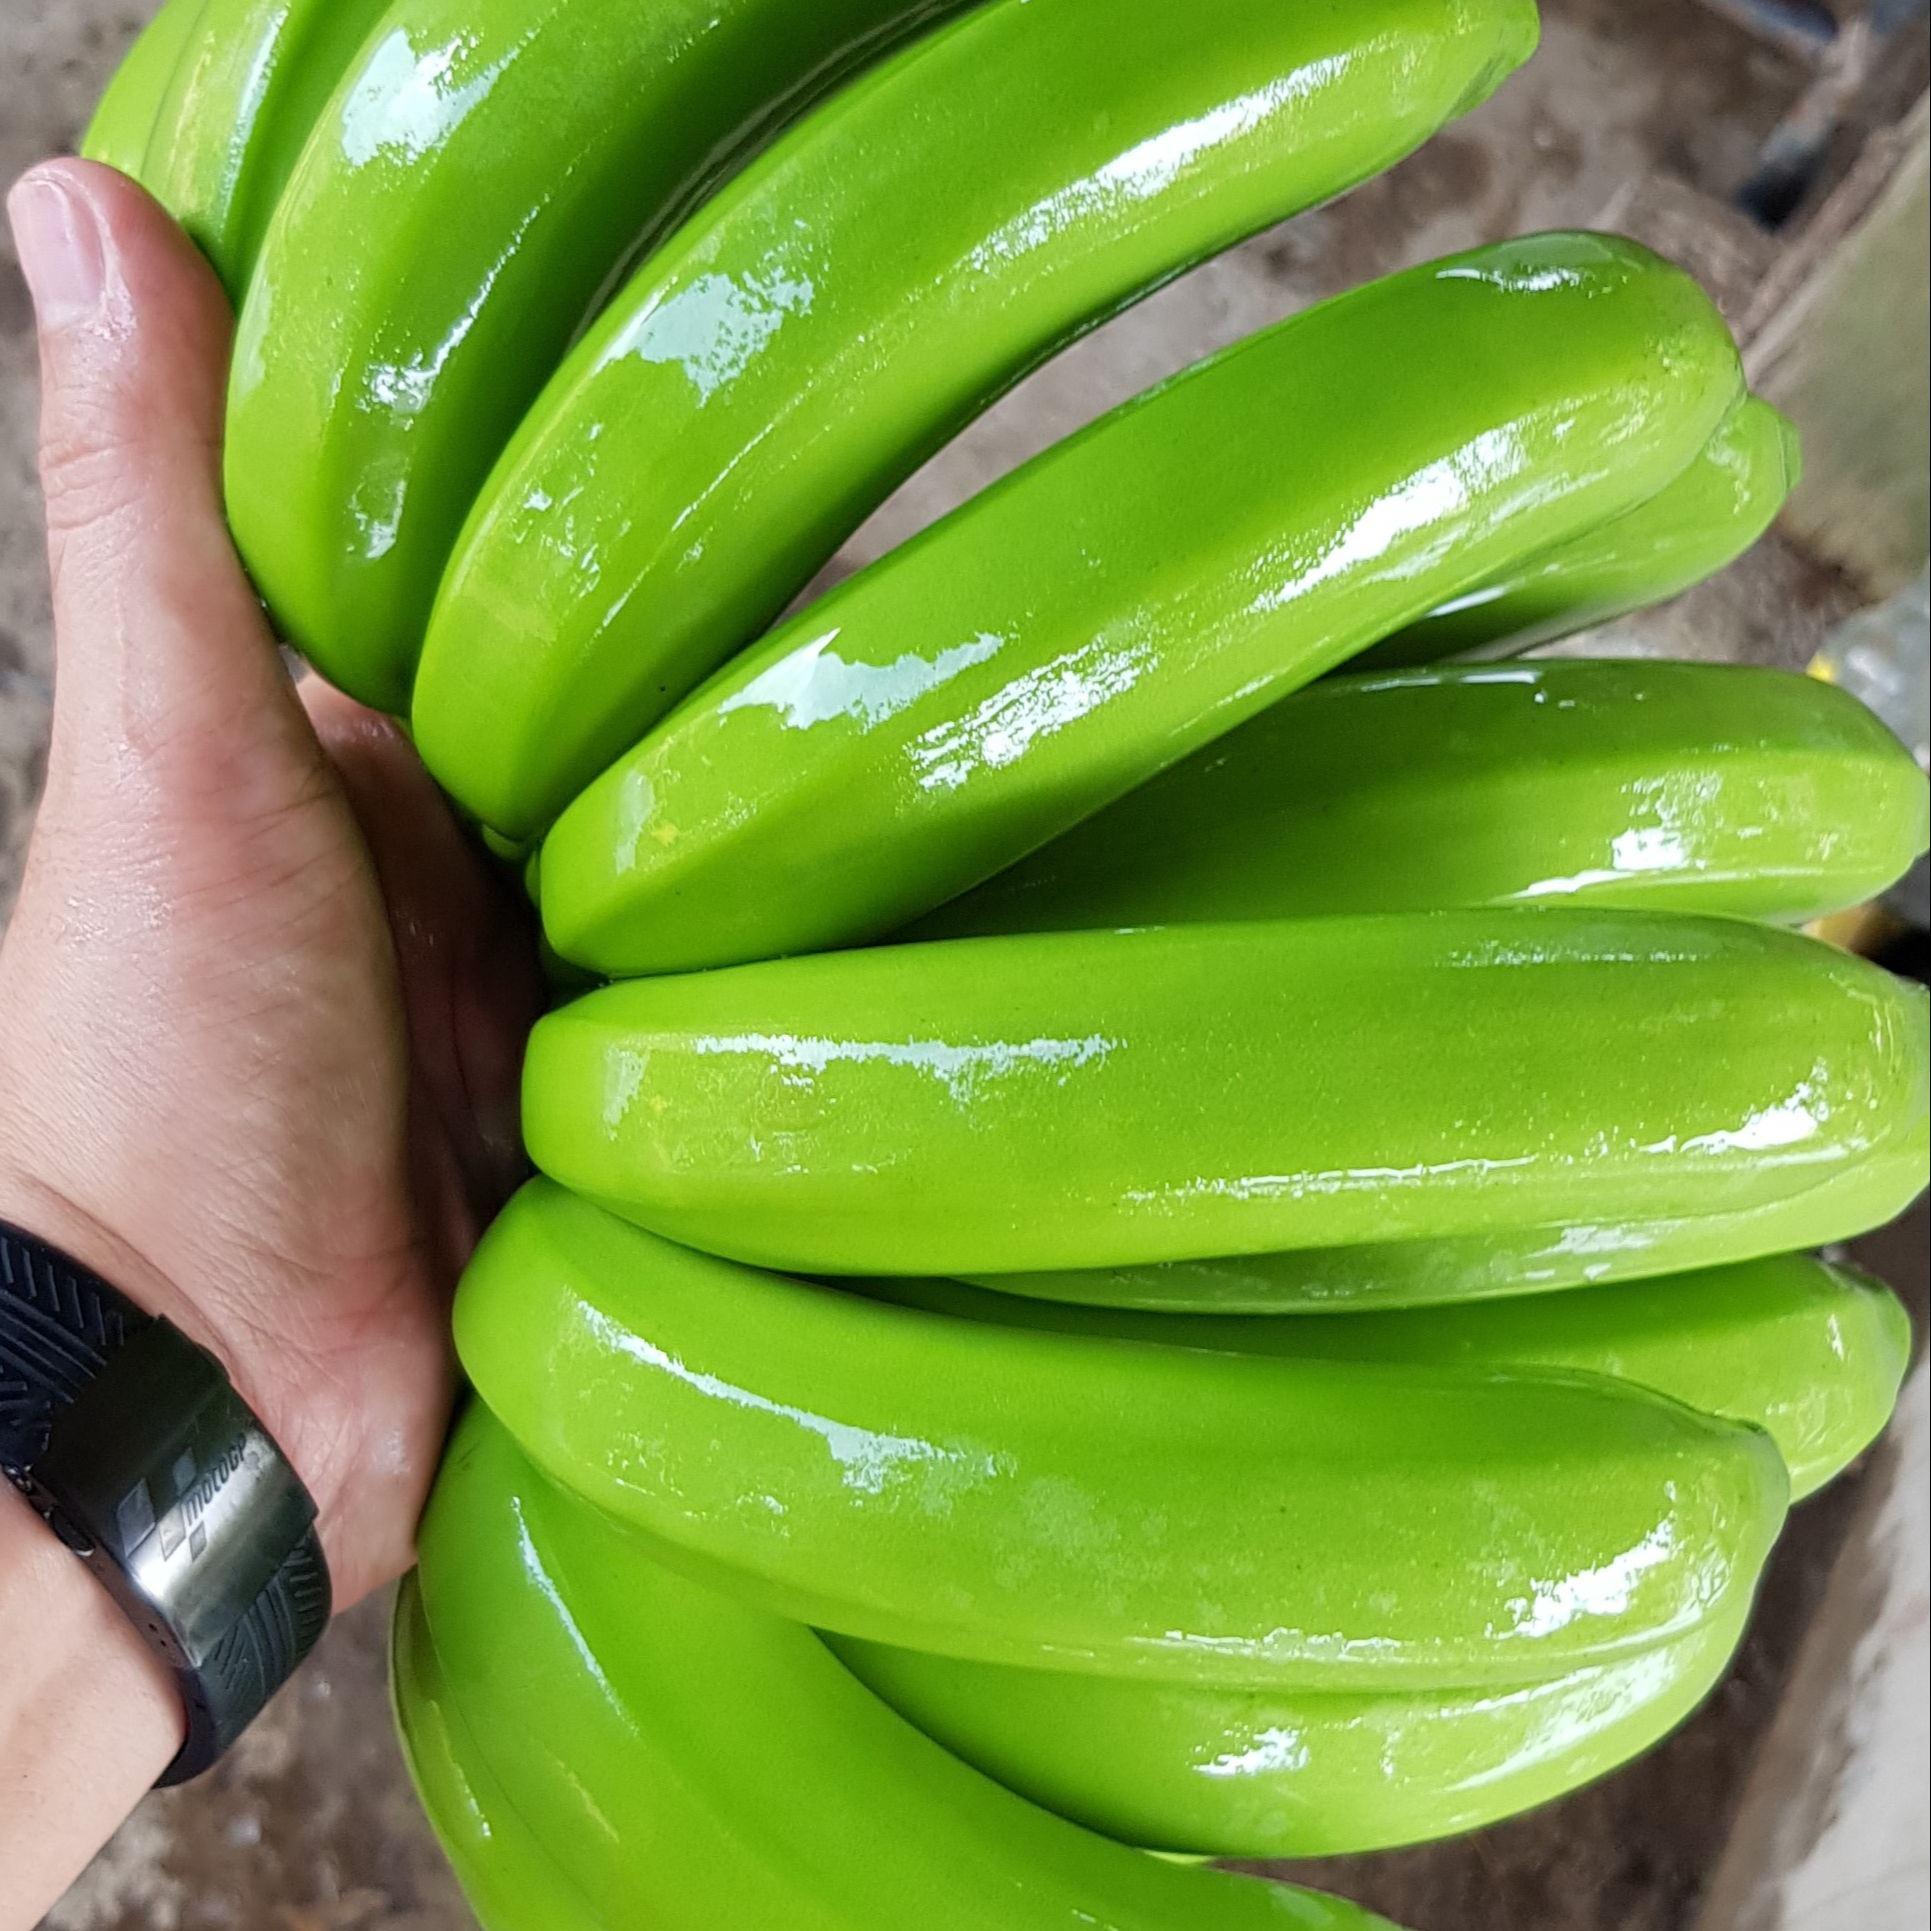 Hot Sale - High Quality Fresh Cavendish Banana